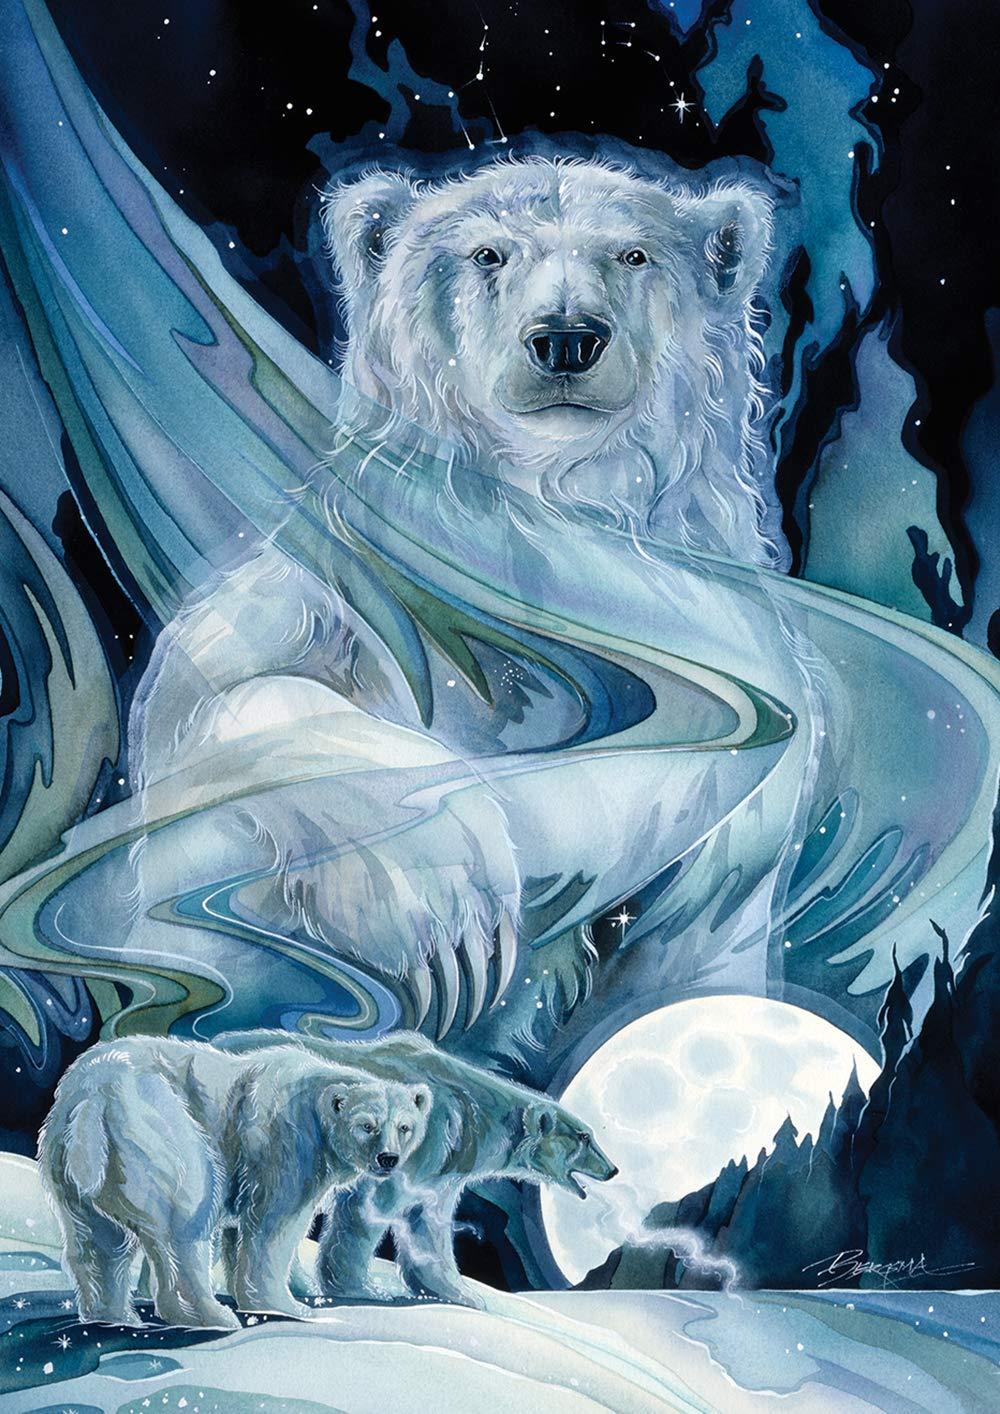 Toland Home Garden 1012244 Moonlight Polar Bears 28 x 40 Inch Decorative, Winter Animal Moon House Flag